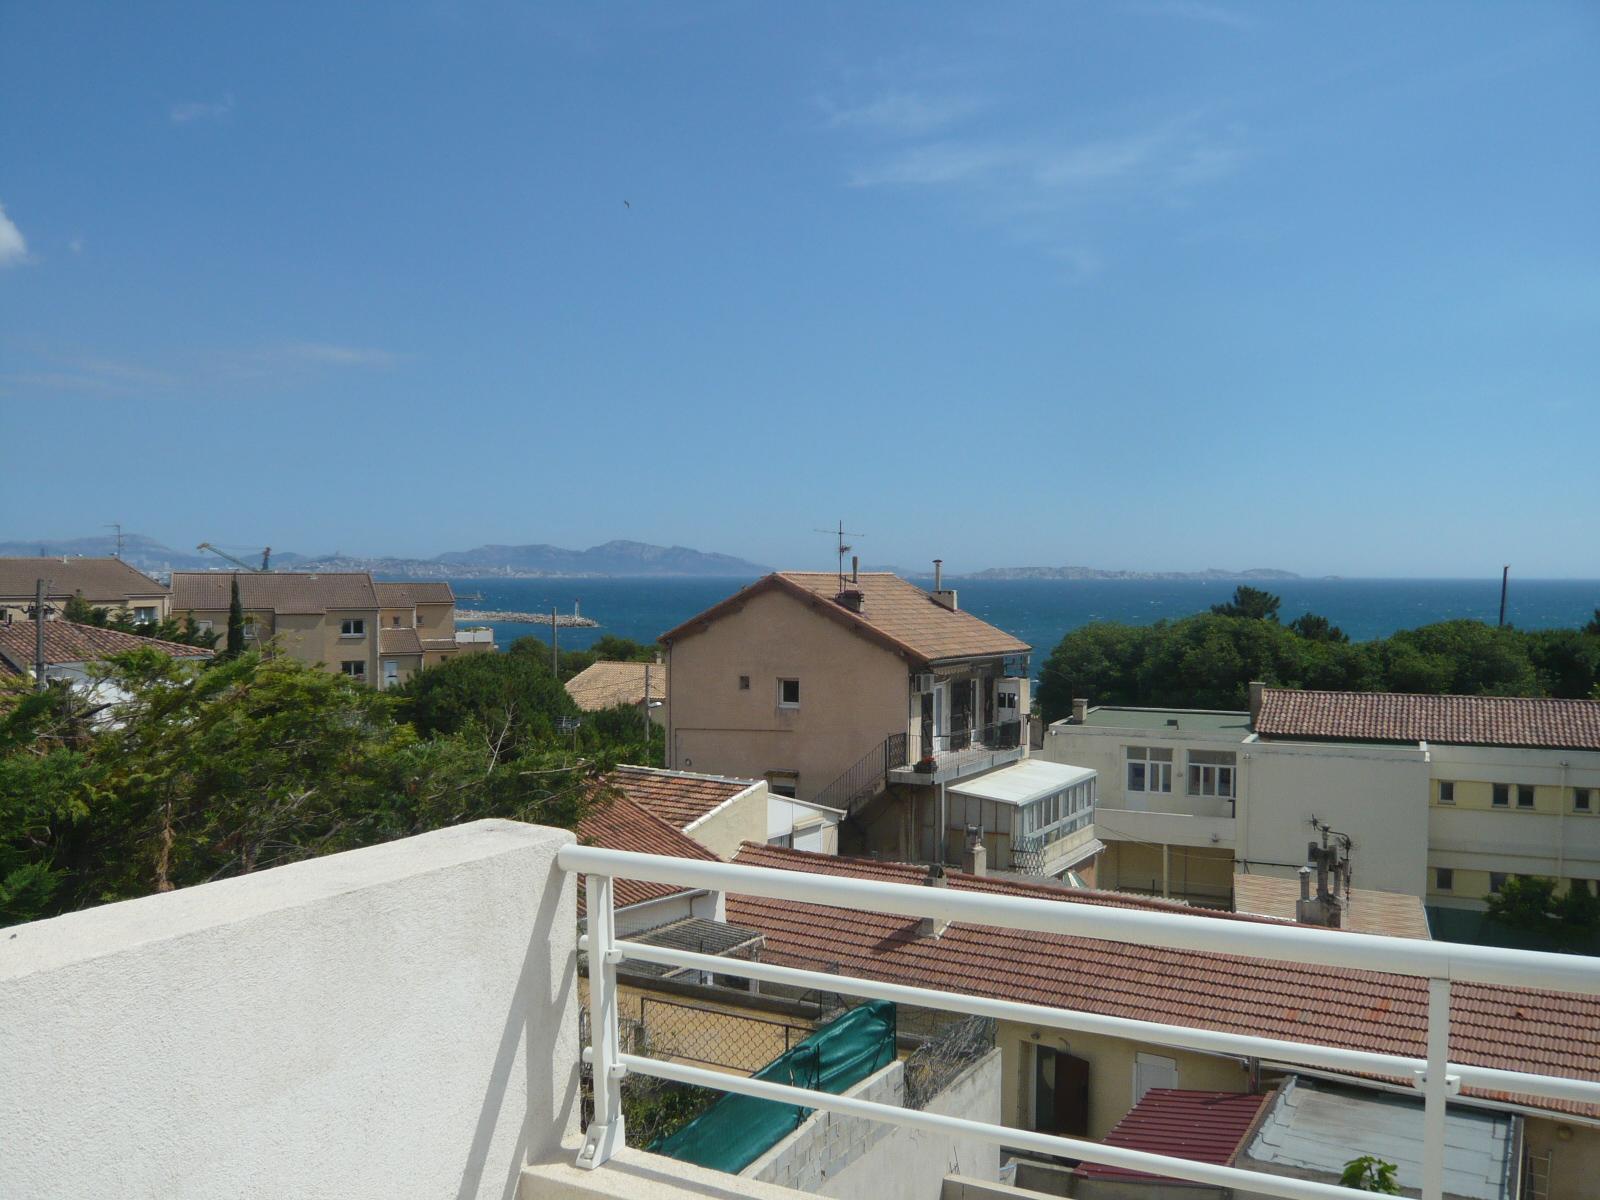 Marseille acheter appartement duplex standing t4 f4 for Acheter maison paris 16